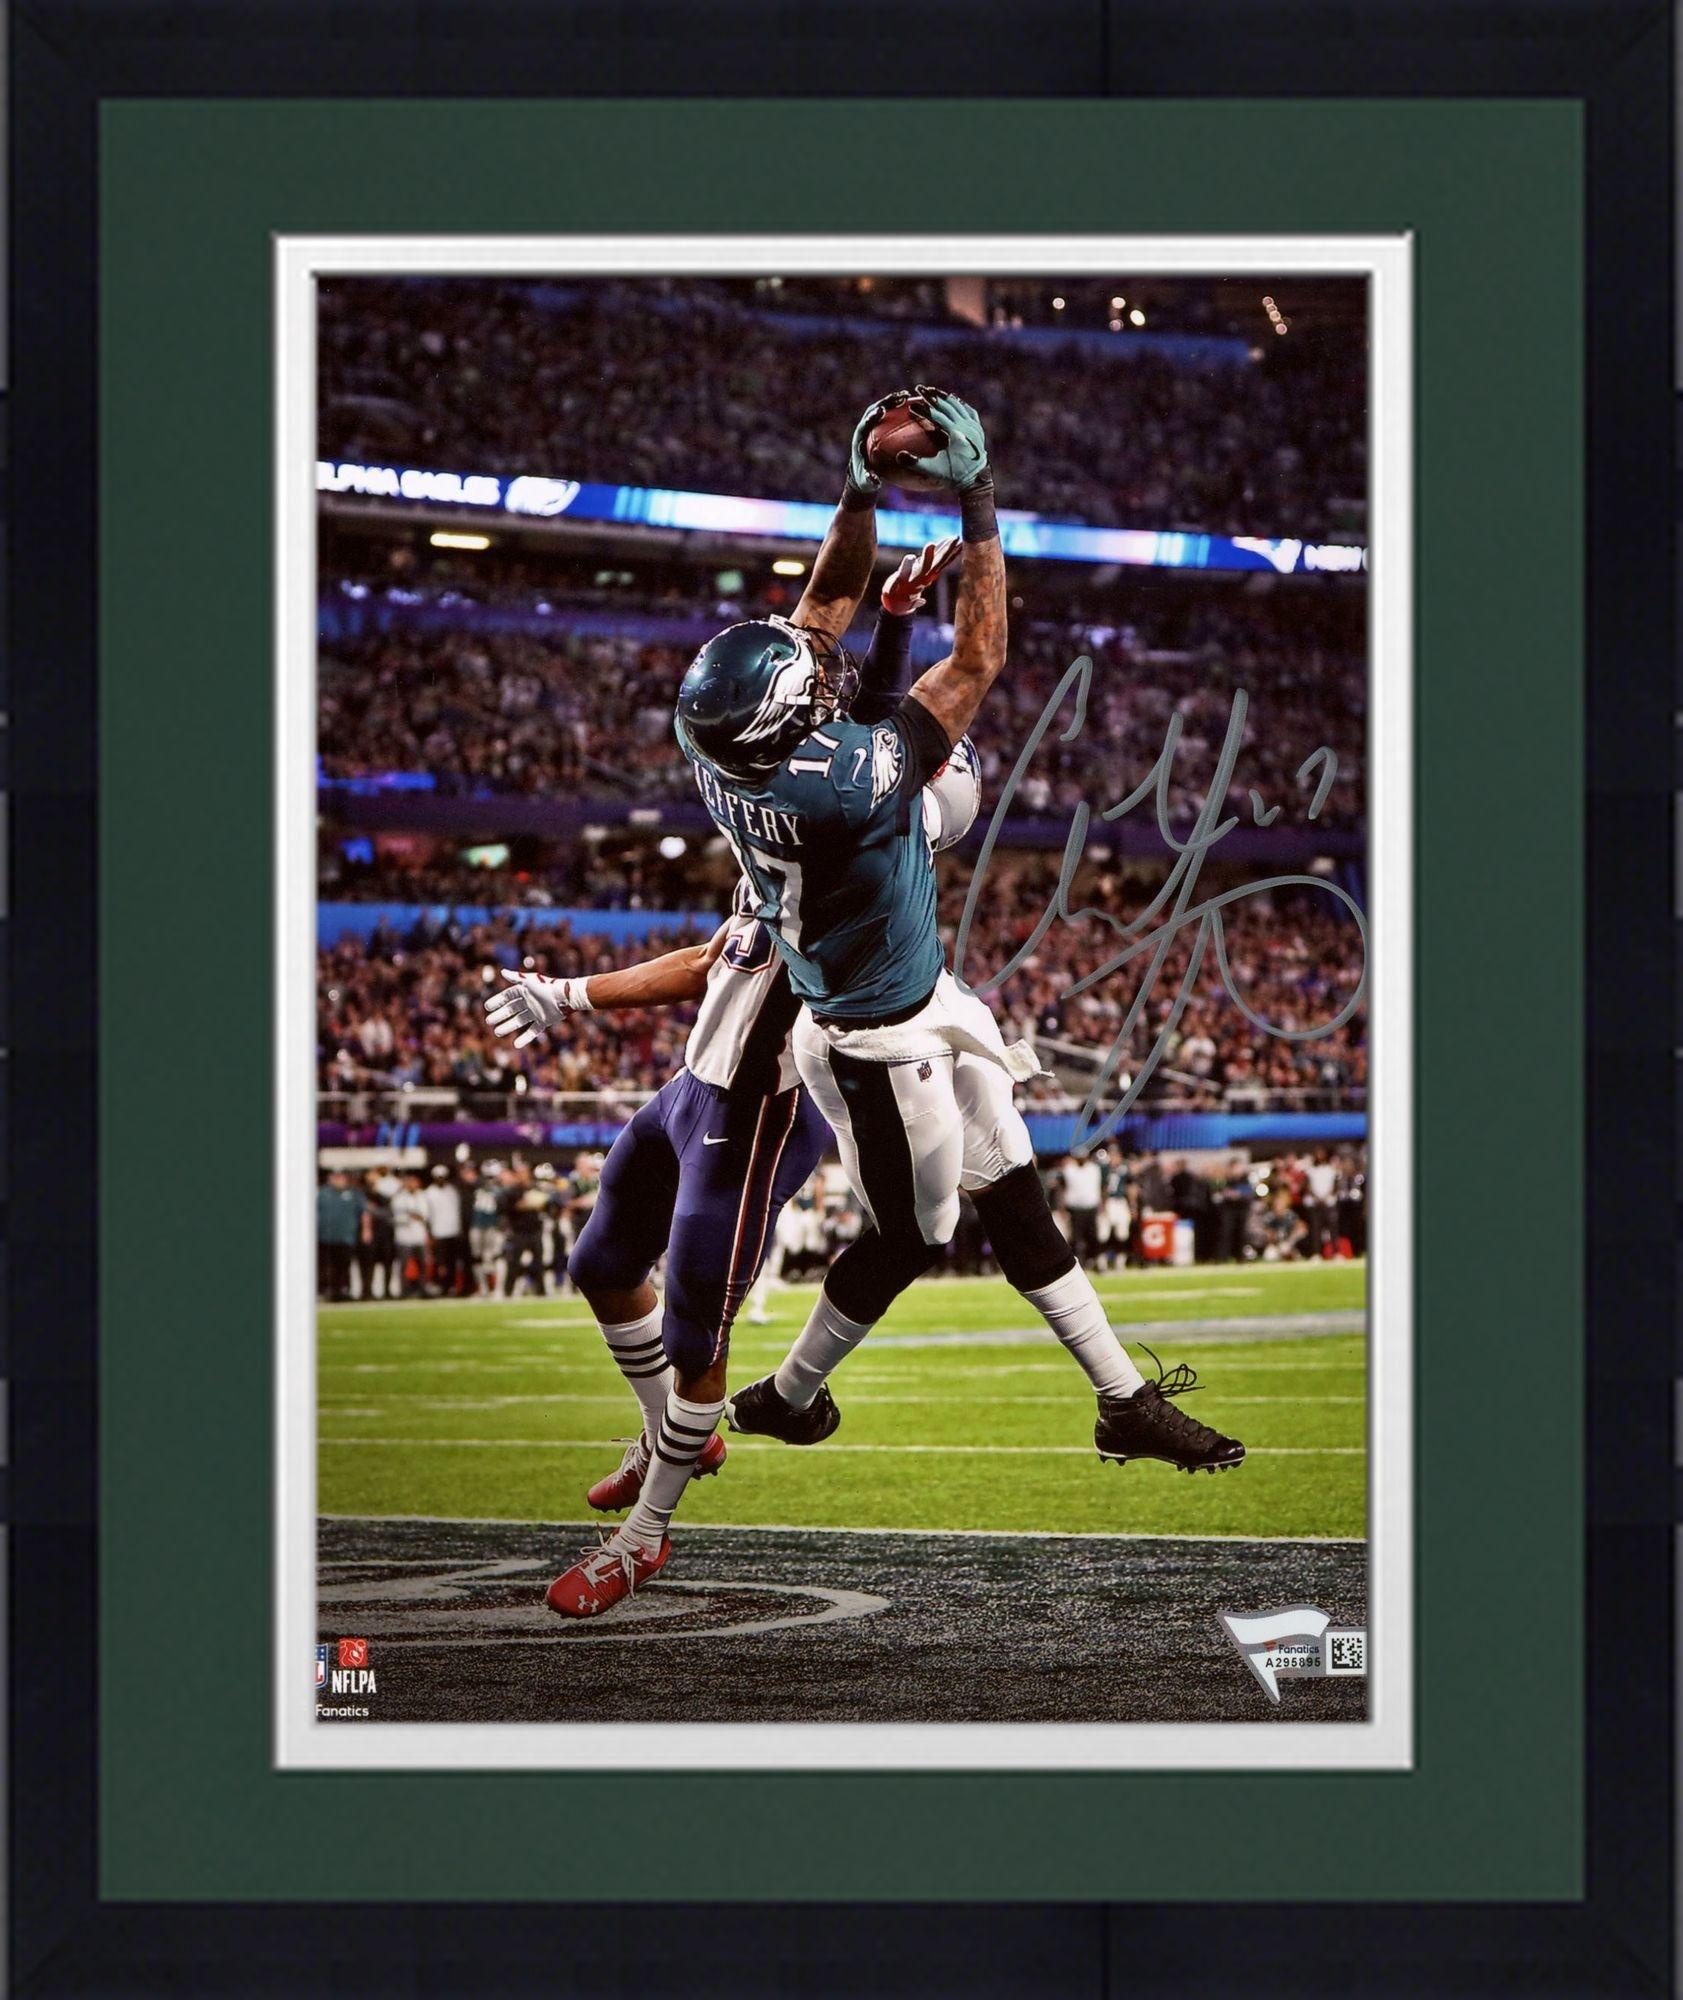 "Framed Alshon Jeffery Philadelphia Eagles Autographed 8"" x 10"" Super Bowl LII Champions Photograph Fanatics Authentic Certified"